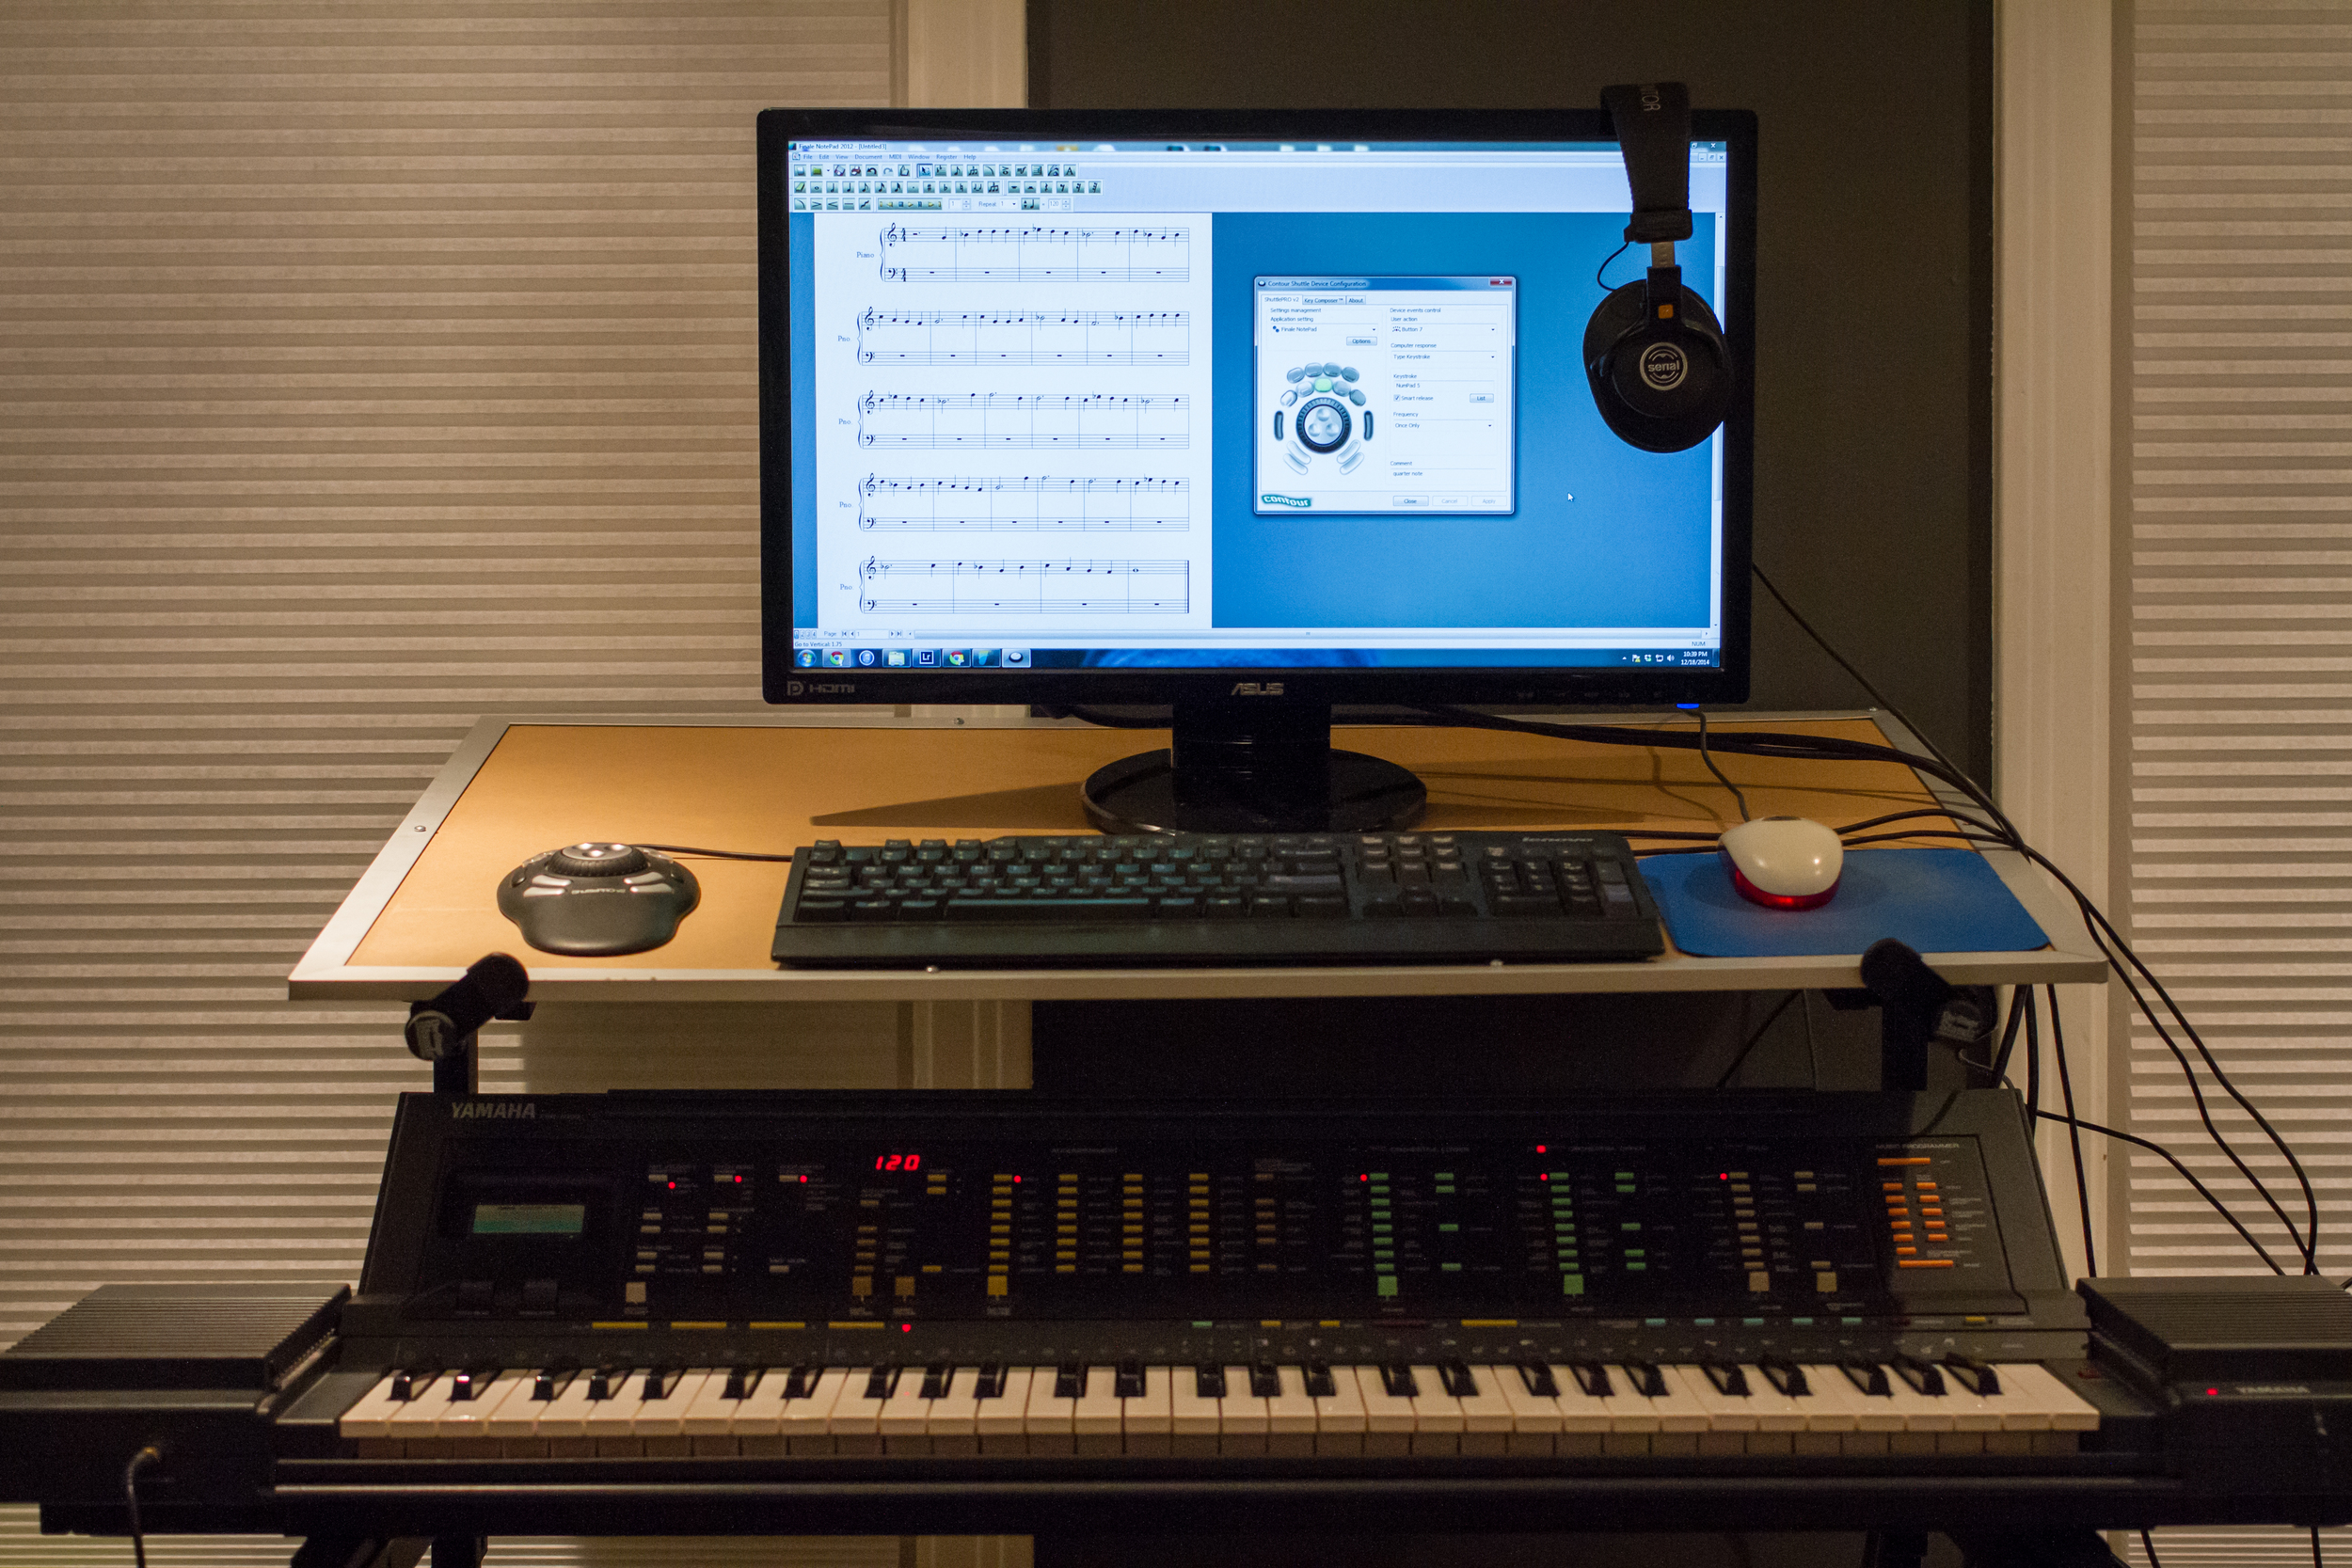 keyboard-12-18